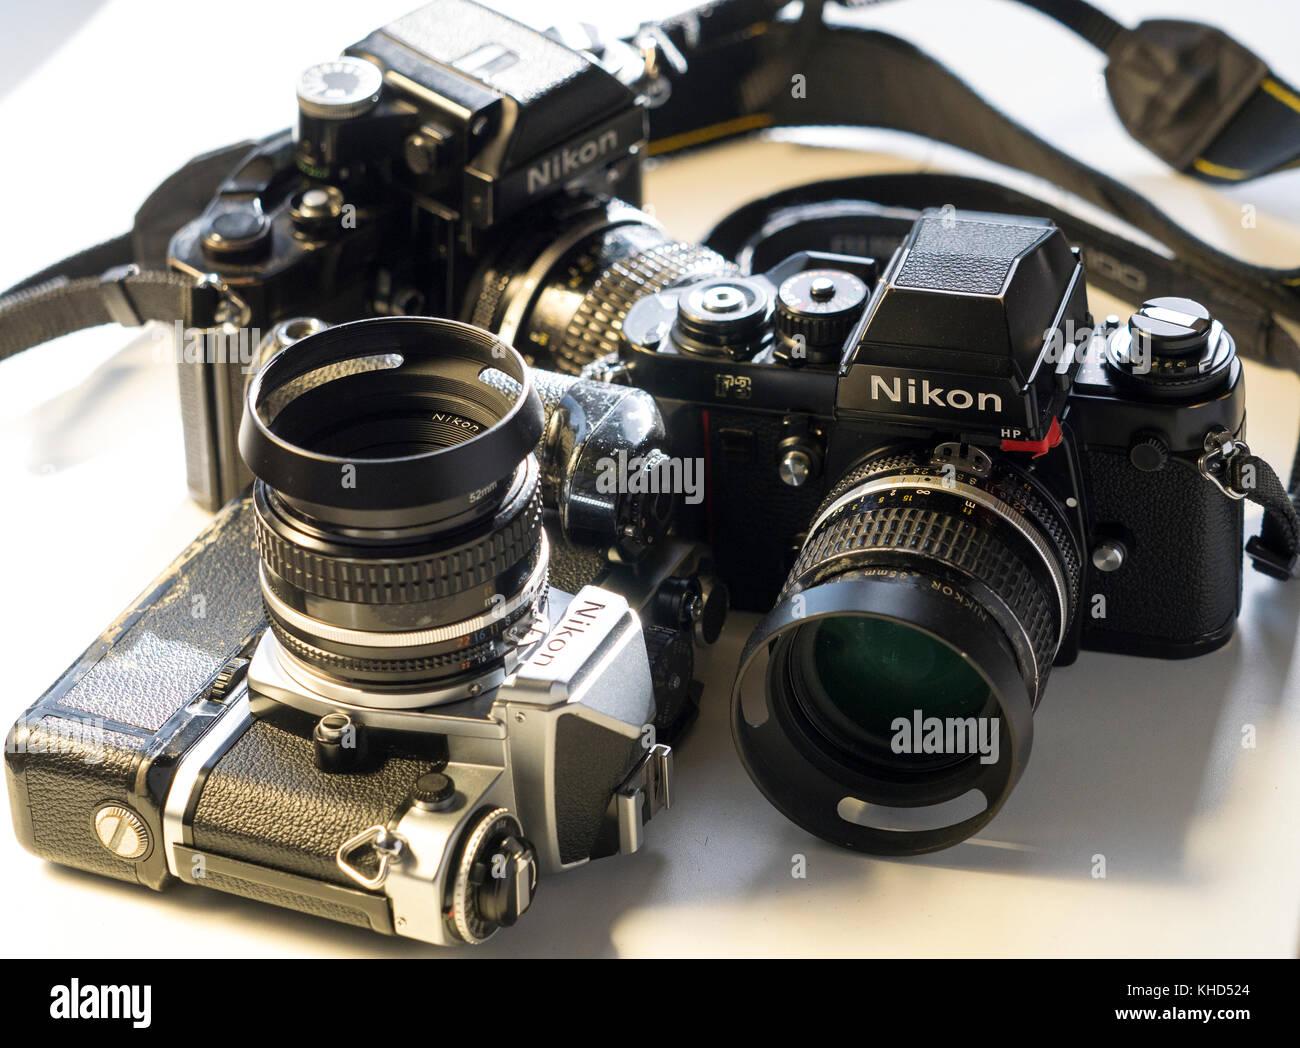 Nikon FE, Nikon FE and Nikon F3 single lens reflex 35mm professional film camera's, Nikon is Japanese company - Stock Image